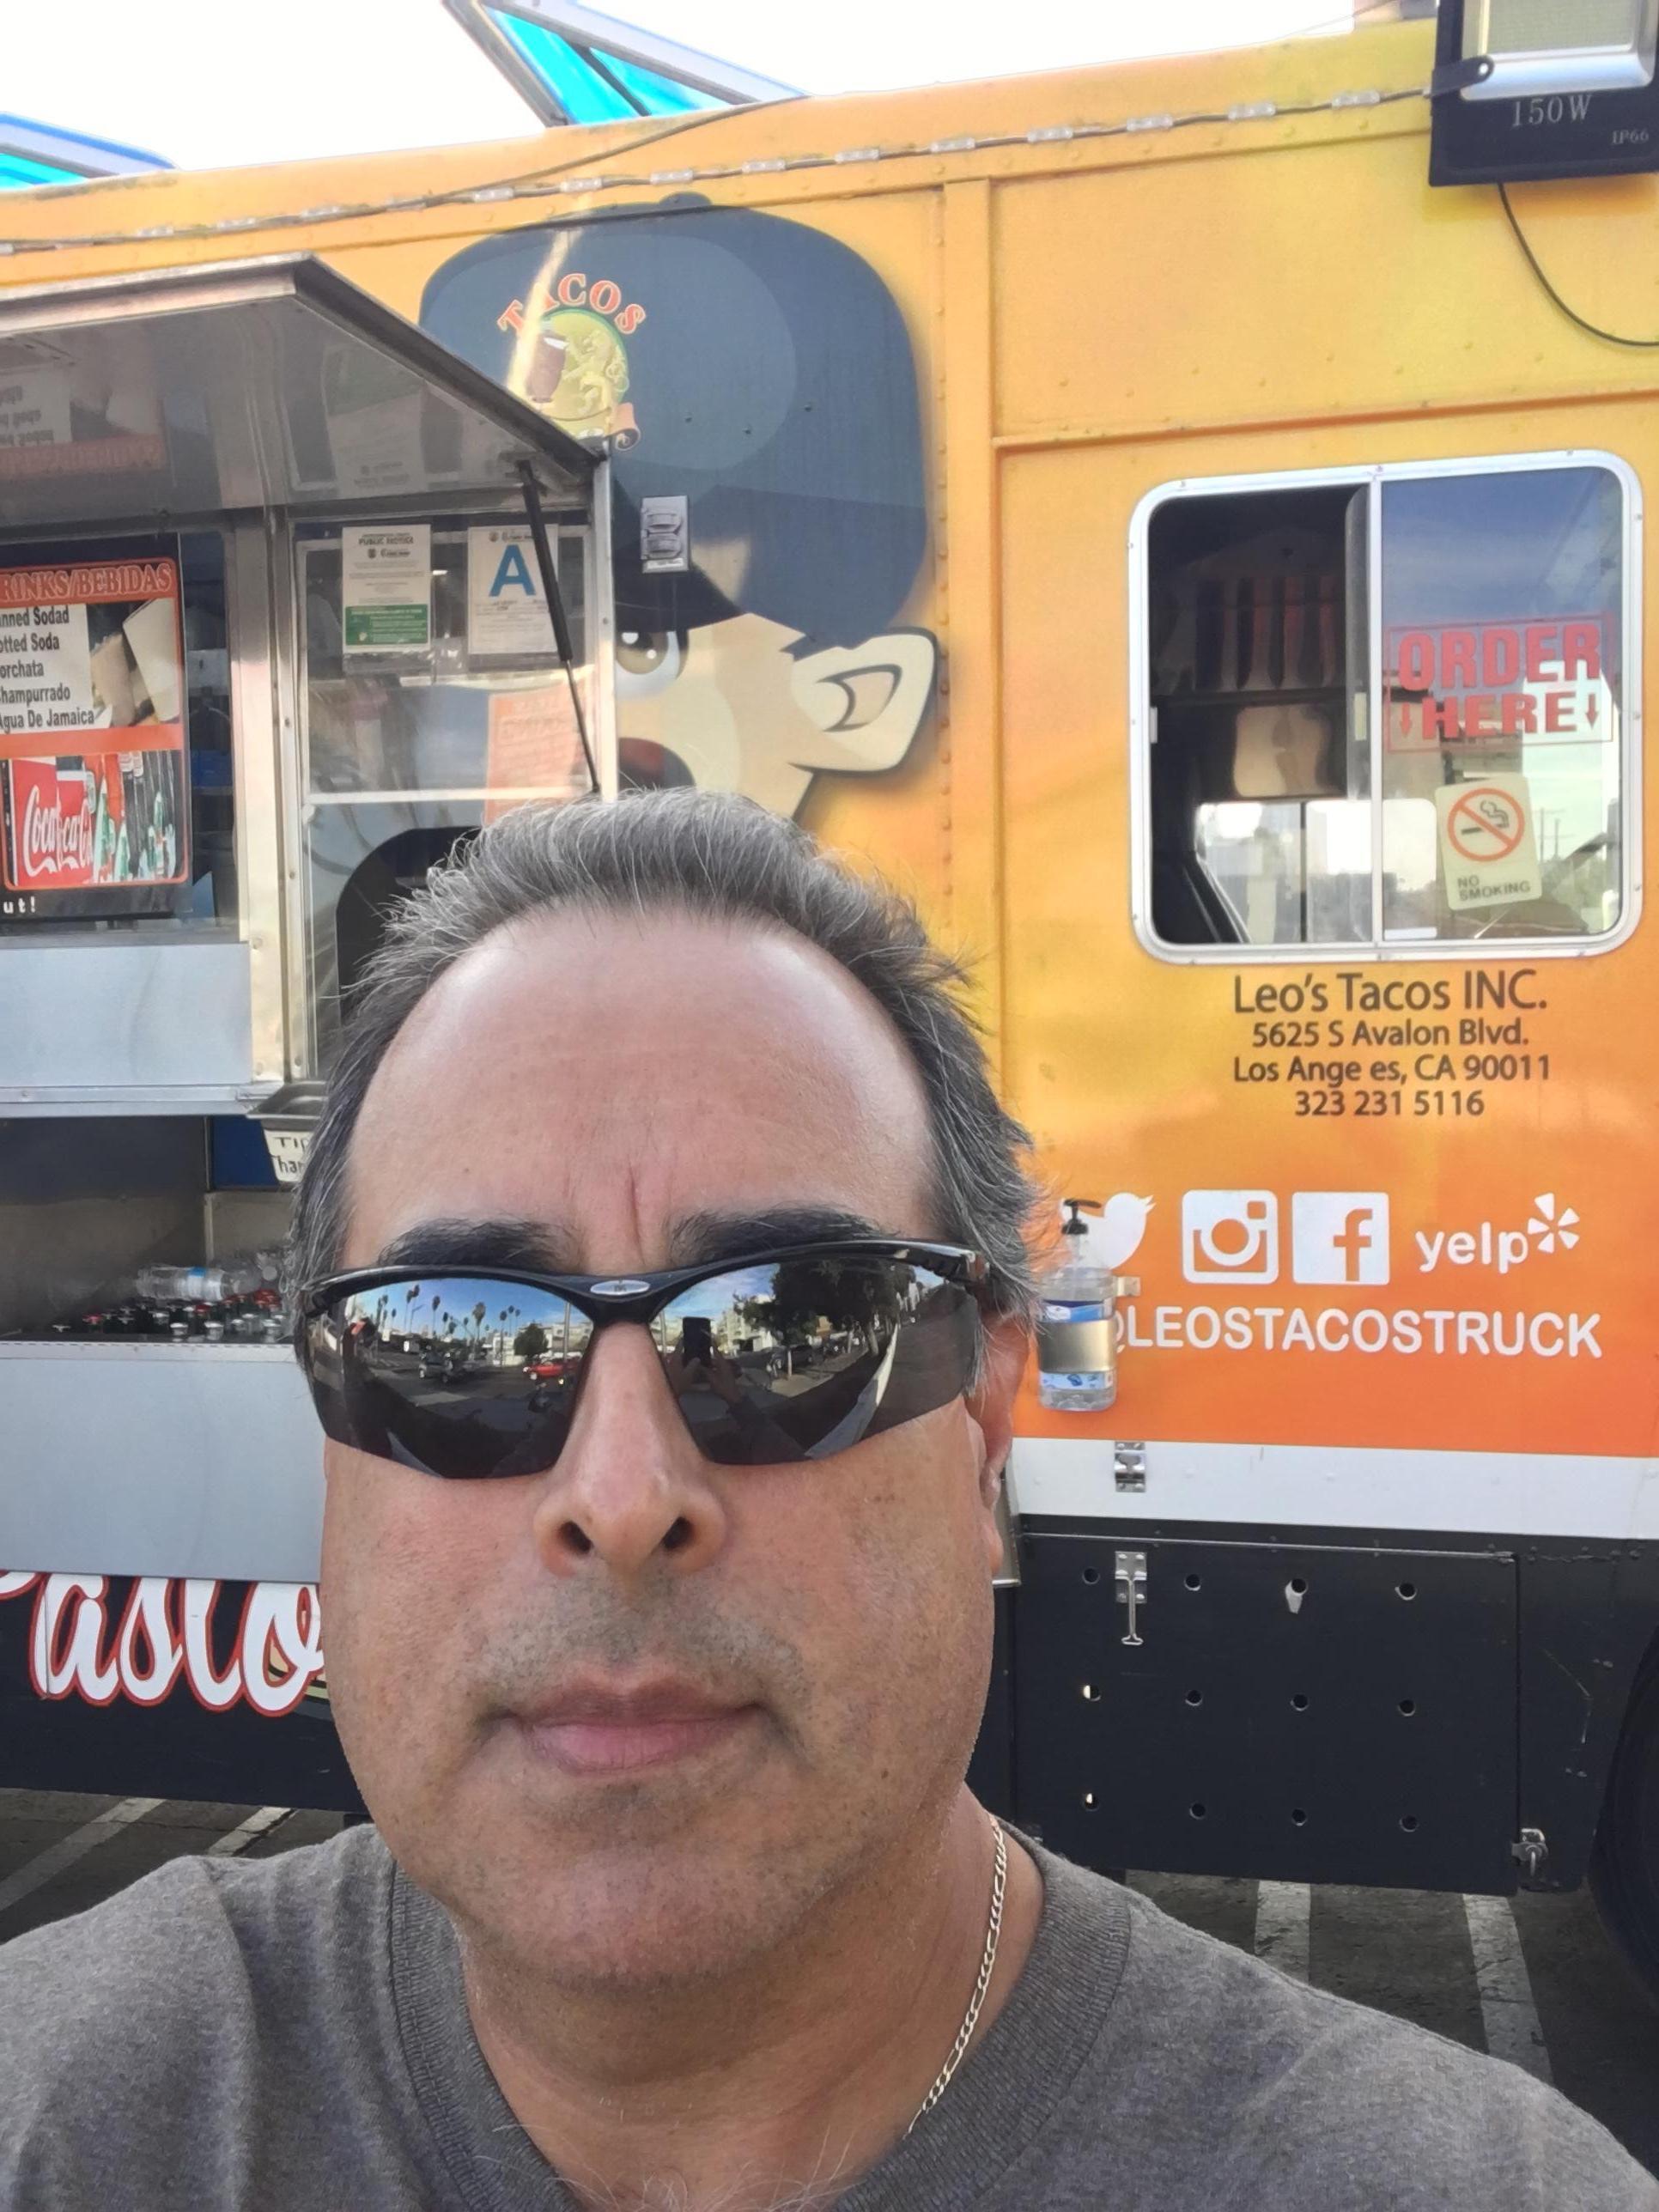 Me at taco truck